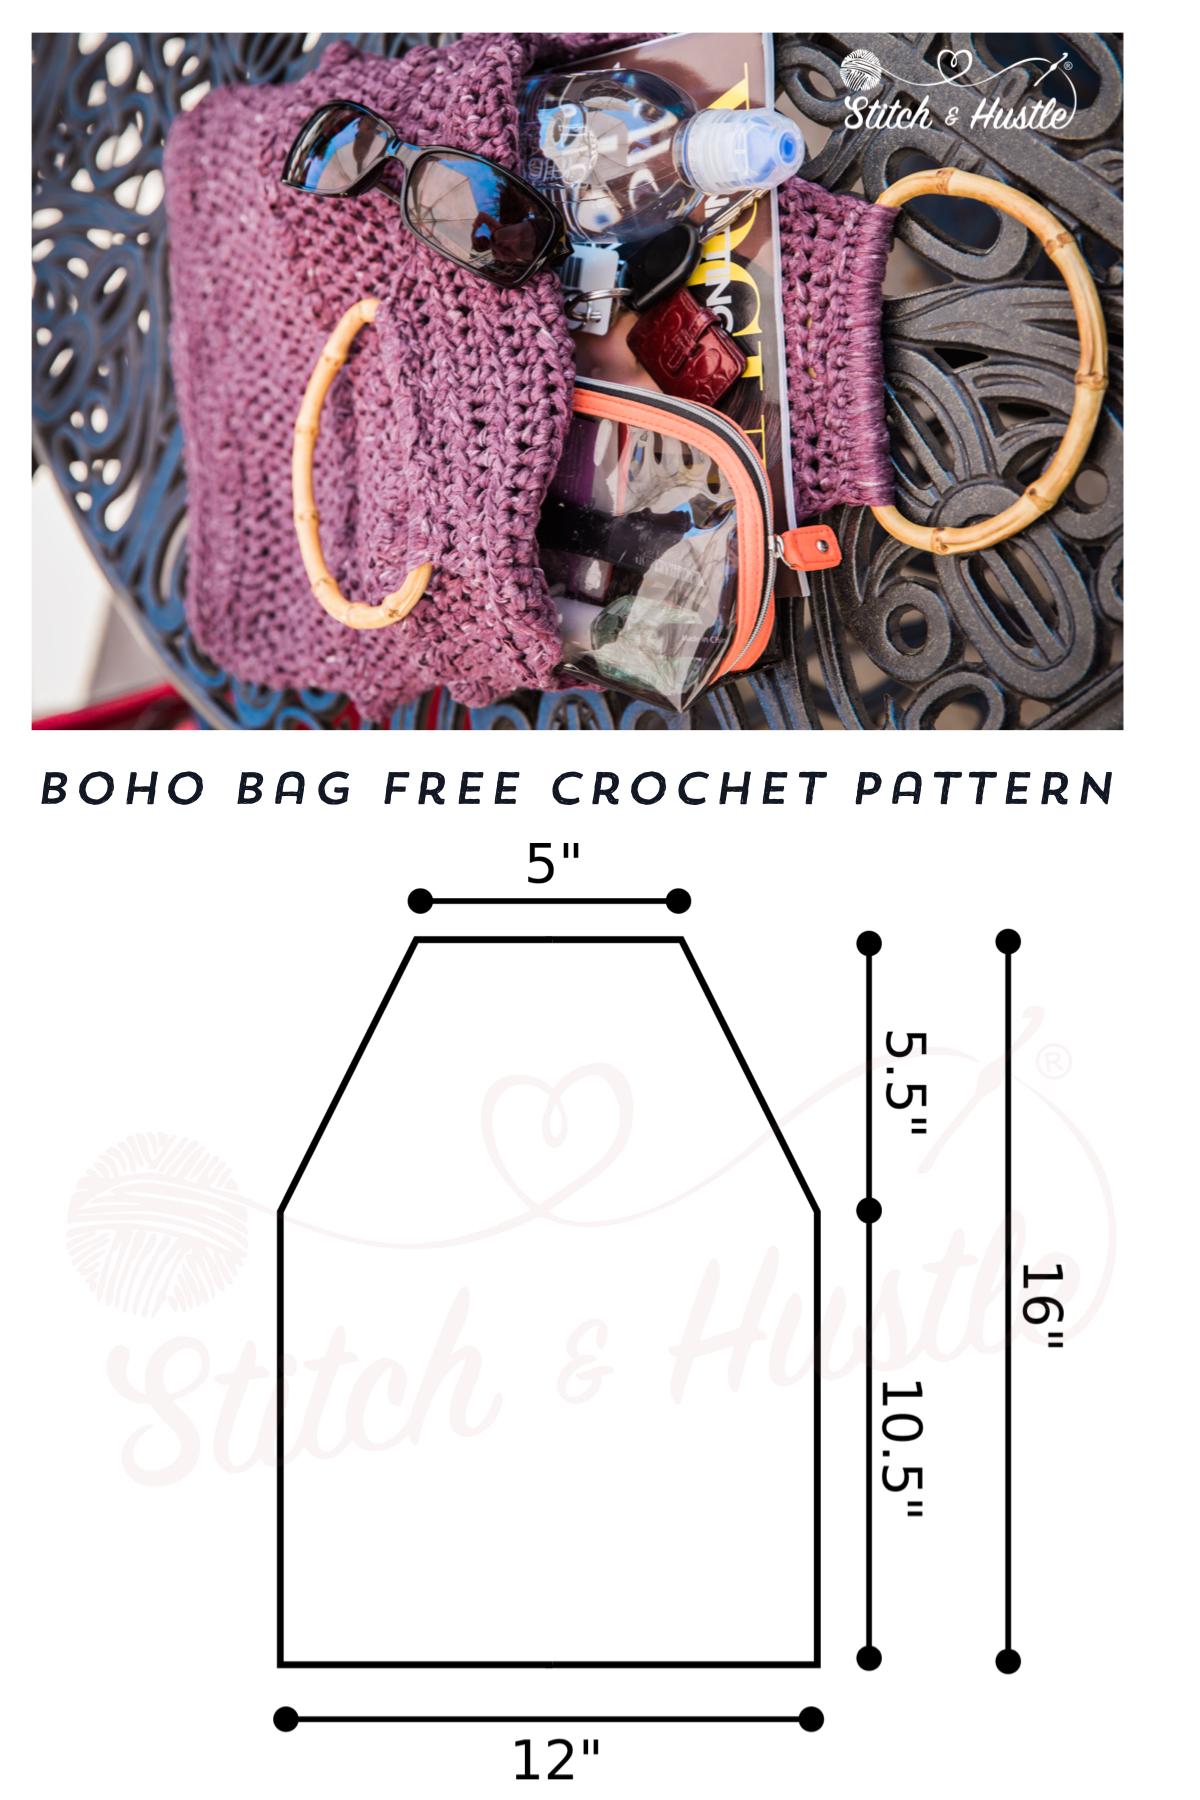 Downtown_Crochet_Bag_Free_pattern_6.jpg